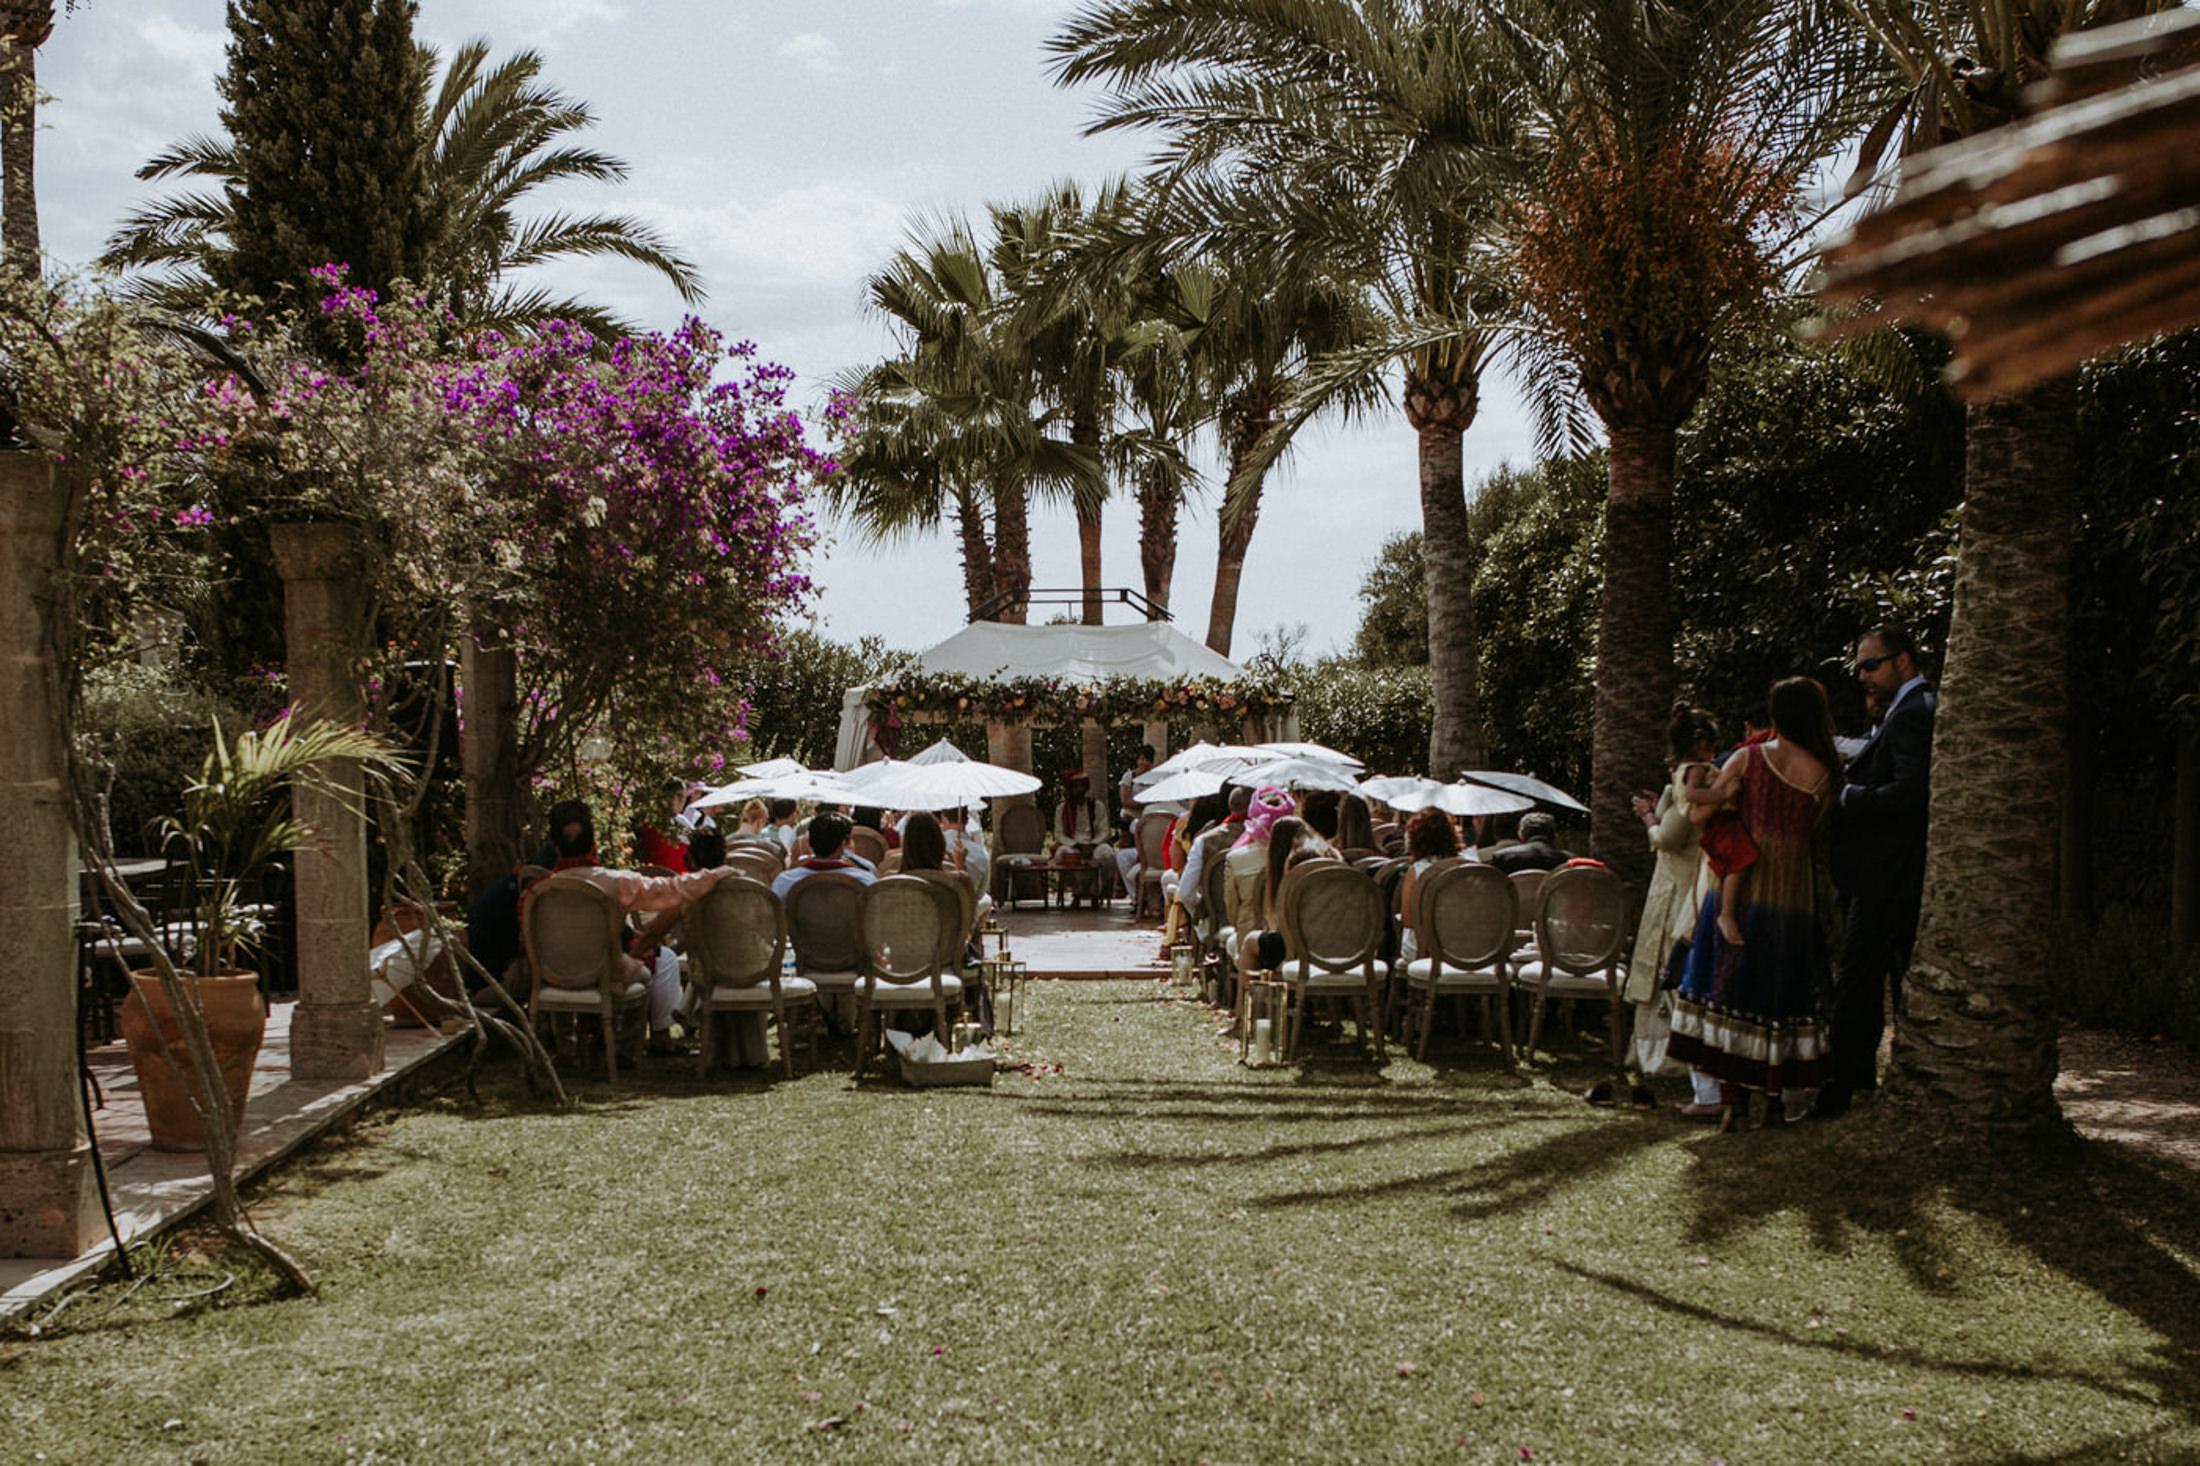 Wedding_Photographer_Mallorca_Daniela-Marquardt_Photography_New_York_Iceland_Tuscany_Santorini_Portugal_Austria_Bavaria_Elopement_Hochzeitsfotograf_AntjeRajat2_40